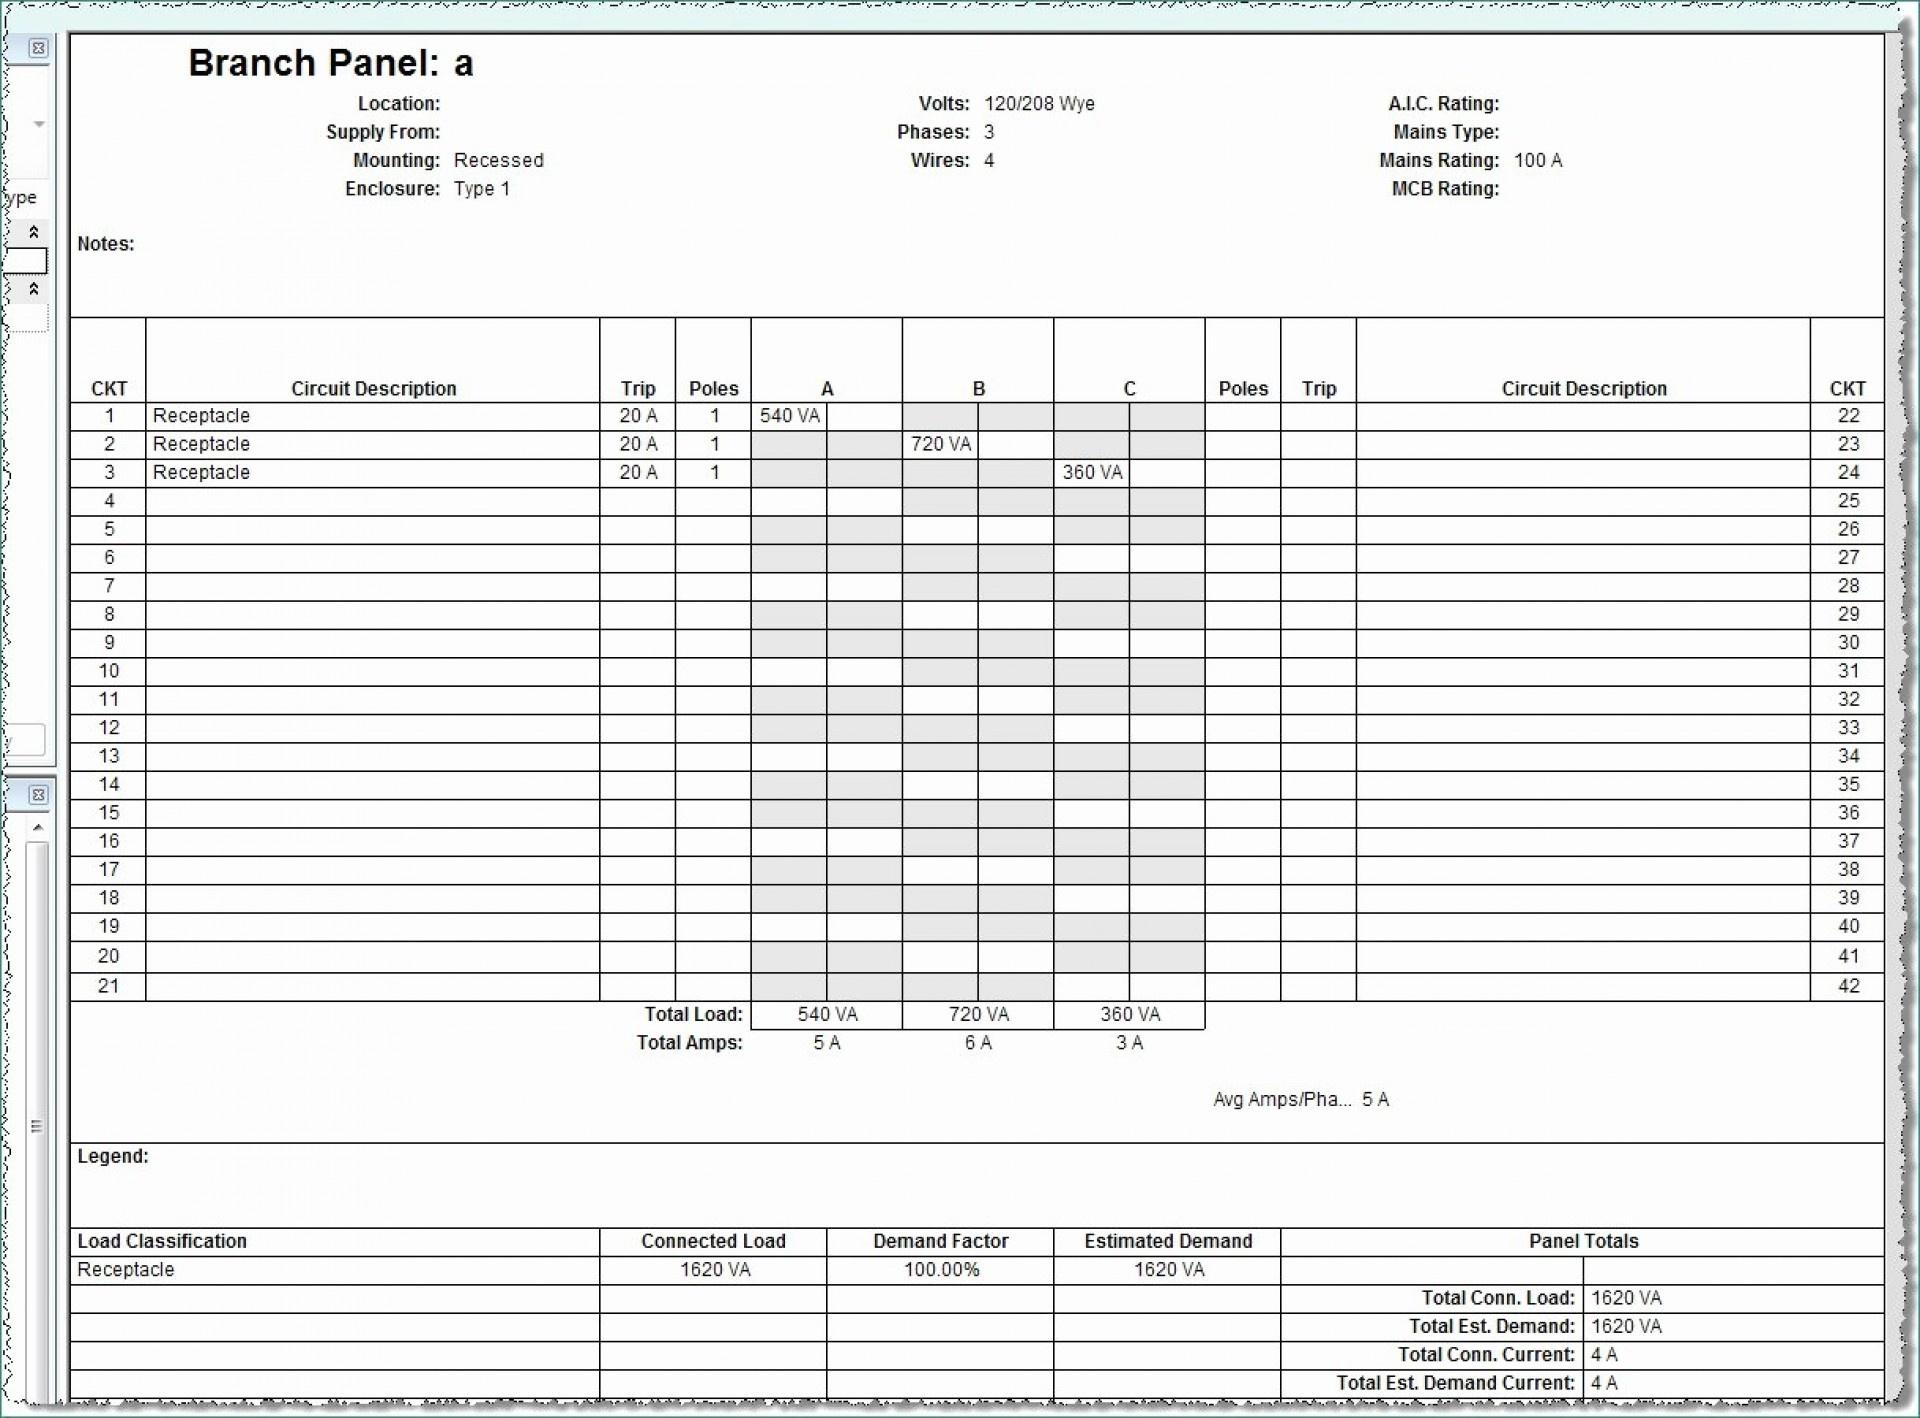 011 Template Ideas Circuit Breaker Panel Wonderful Label Excel Free - Free Printable Circuit Breaker Panel Labels